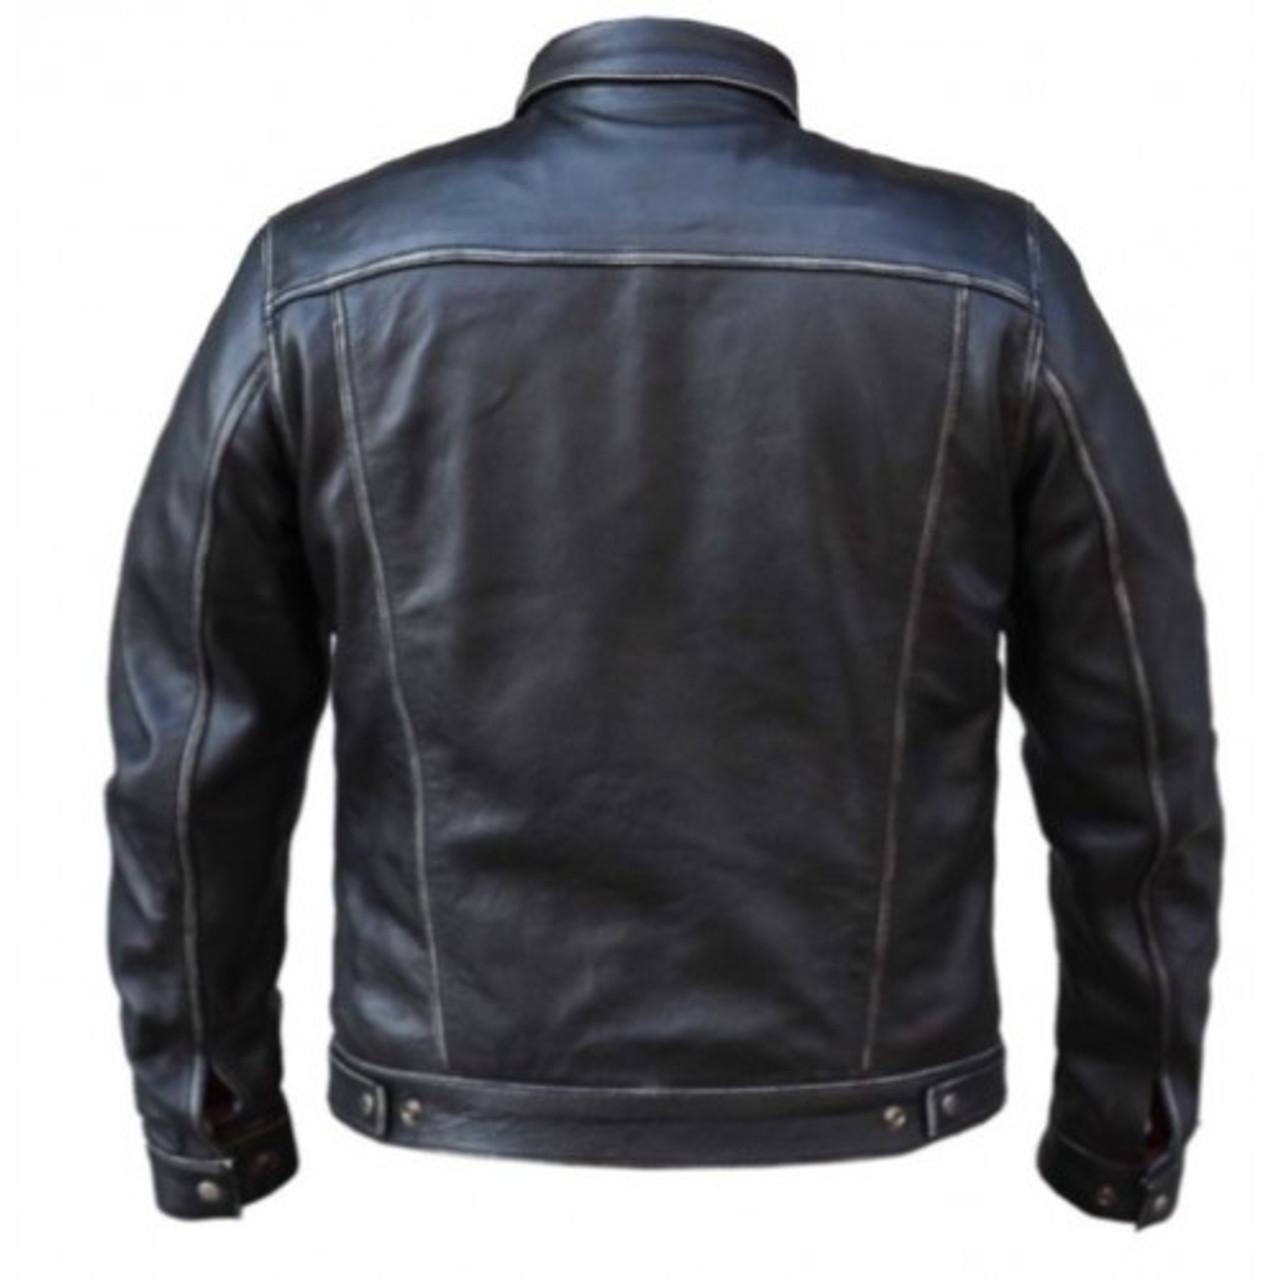 Leather Jean Style Jacket